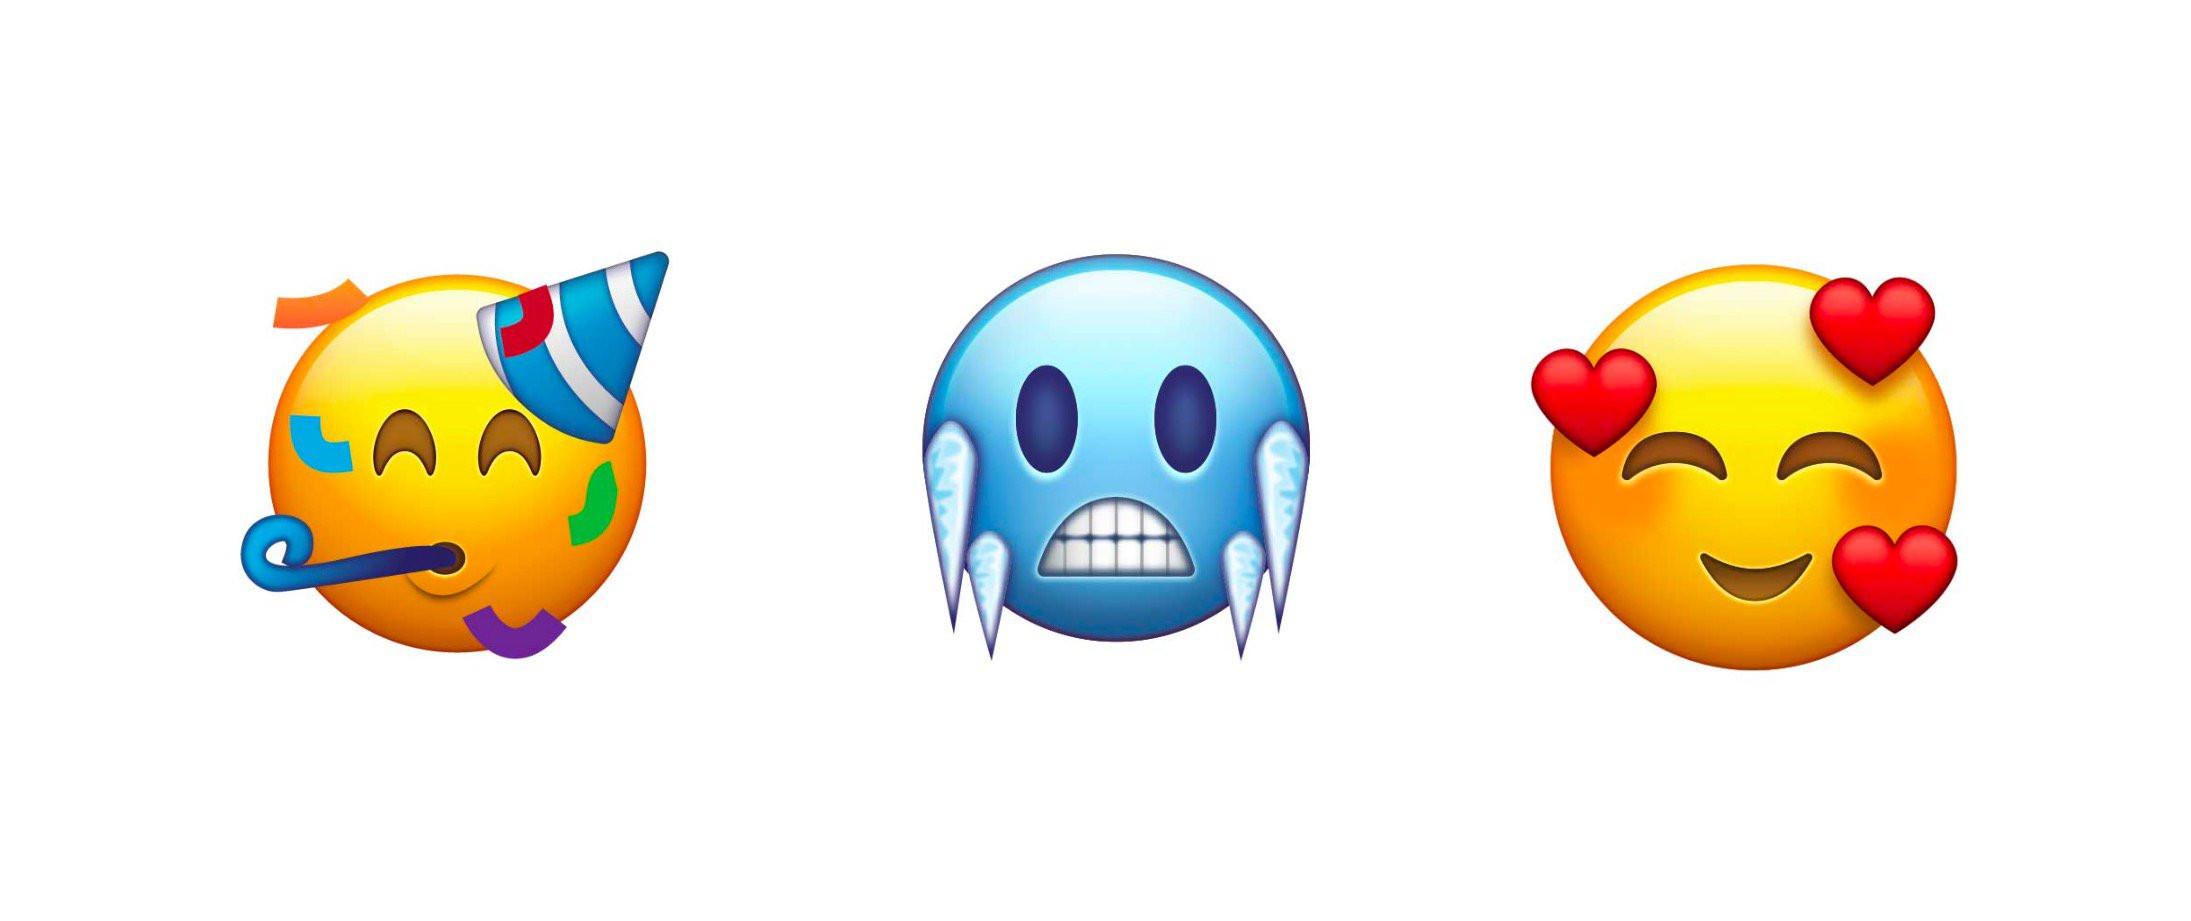 1502104117_2018-emoji-smileys-emojipedia.jpg